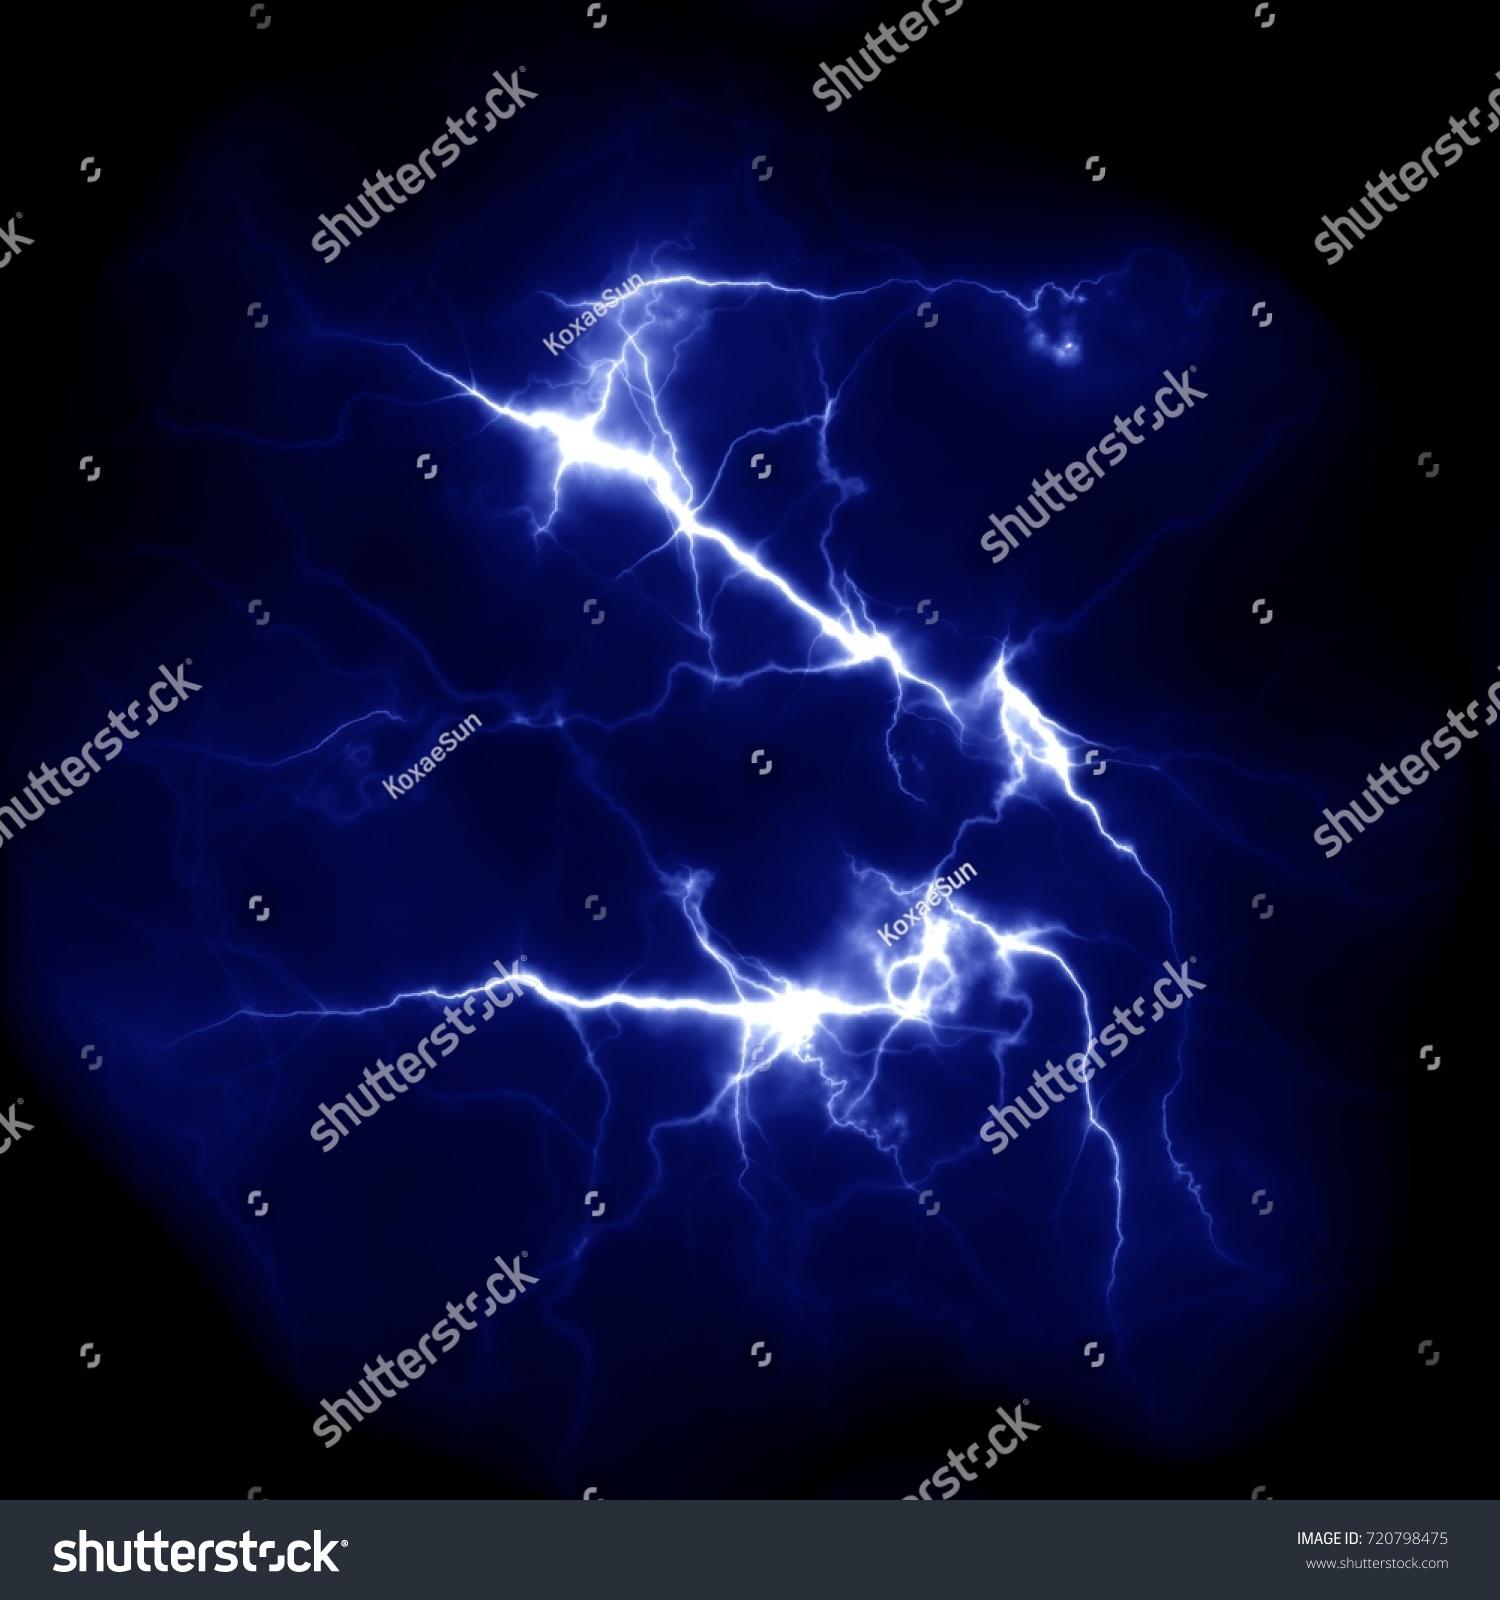 lightning template design electric discharge sky stock illustration